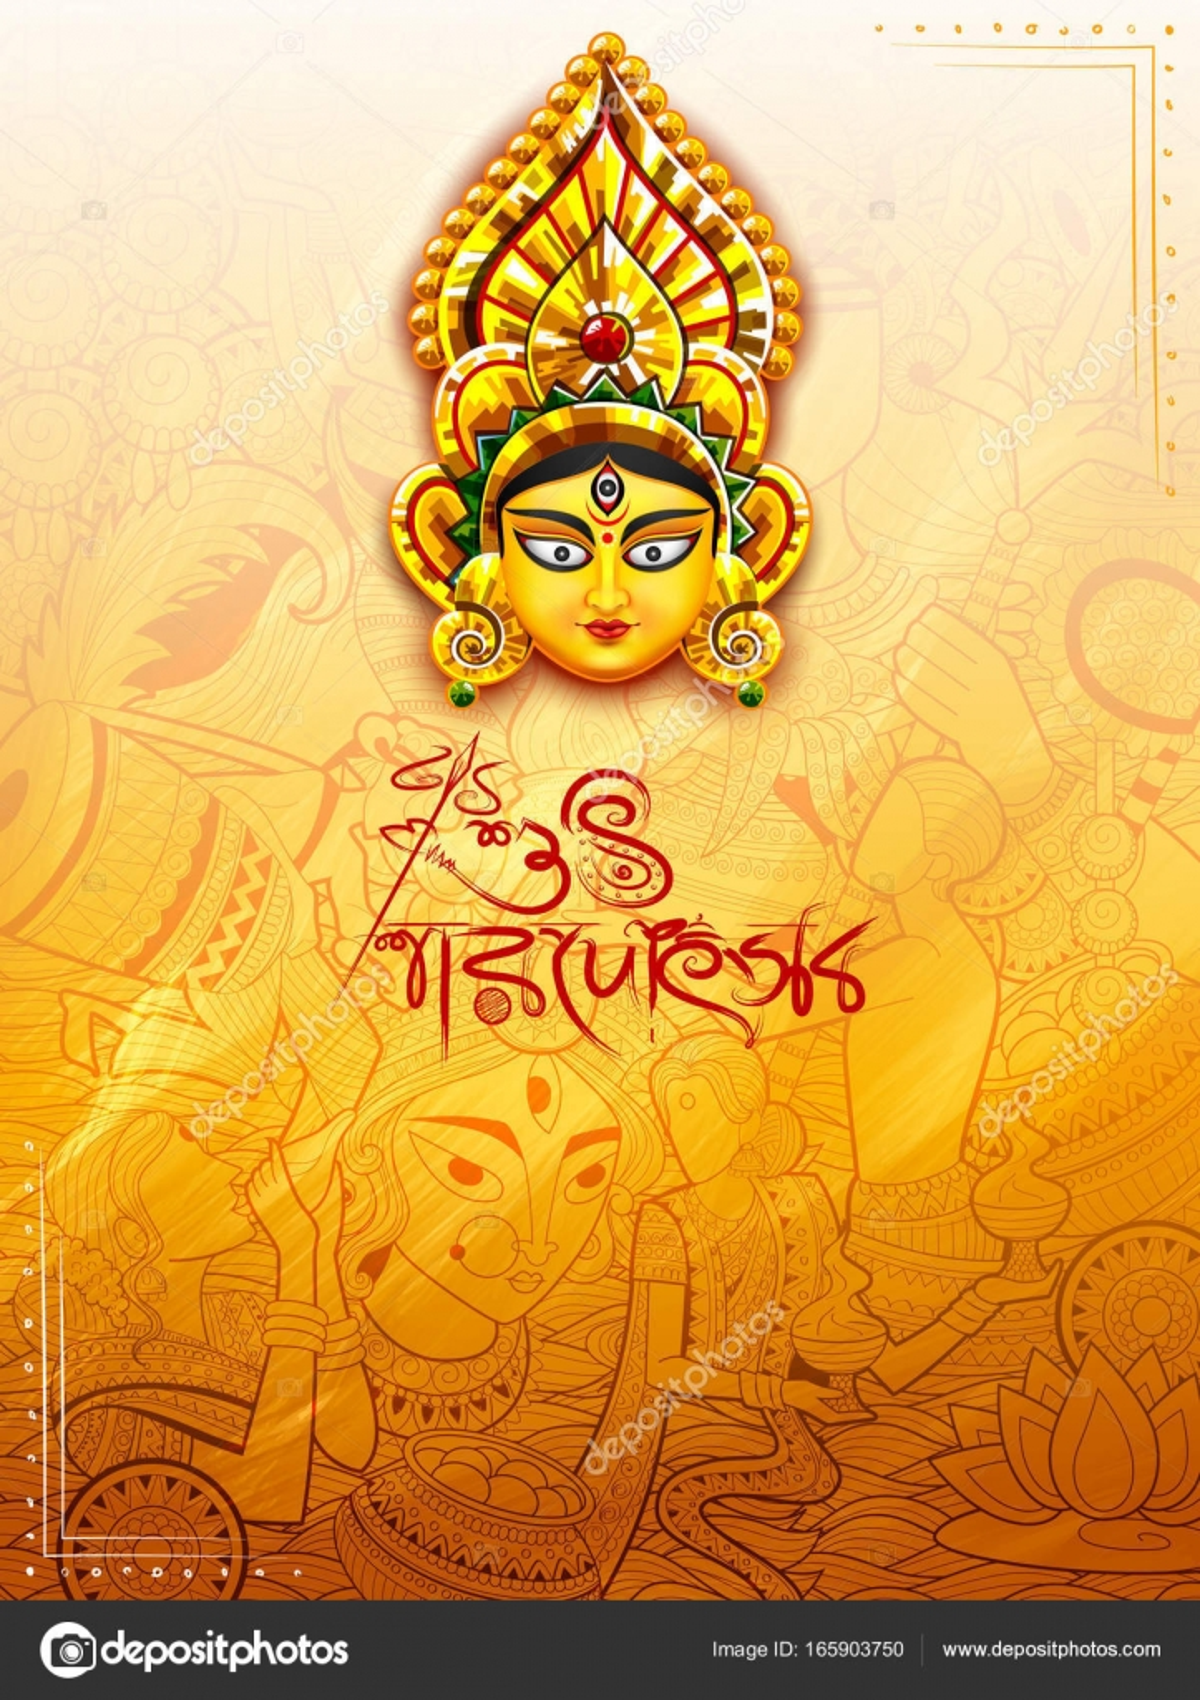 Goddess Durga in Happy Durga Puja background with bengali text